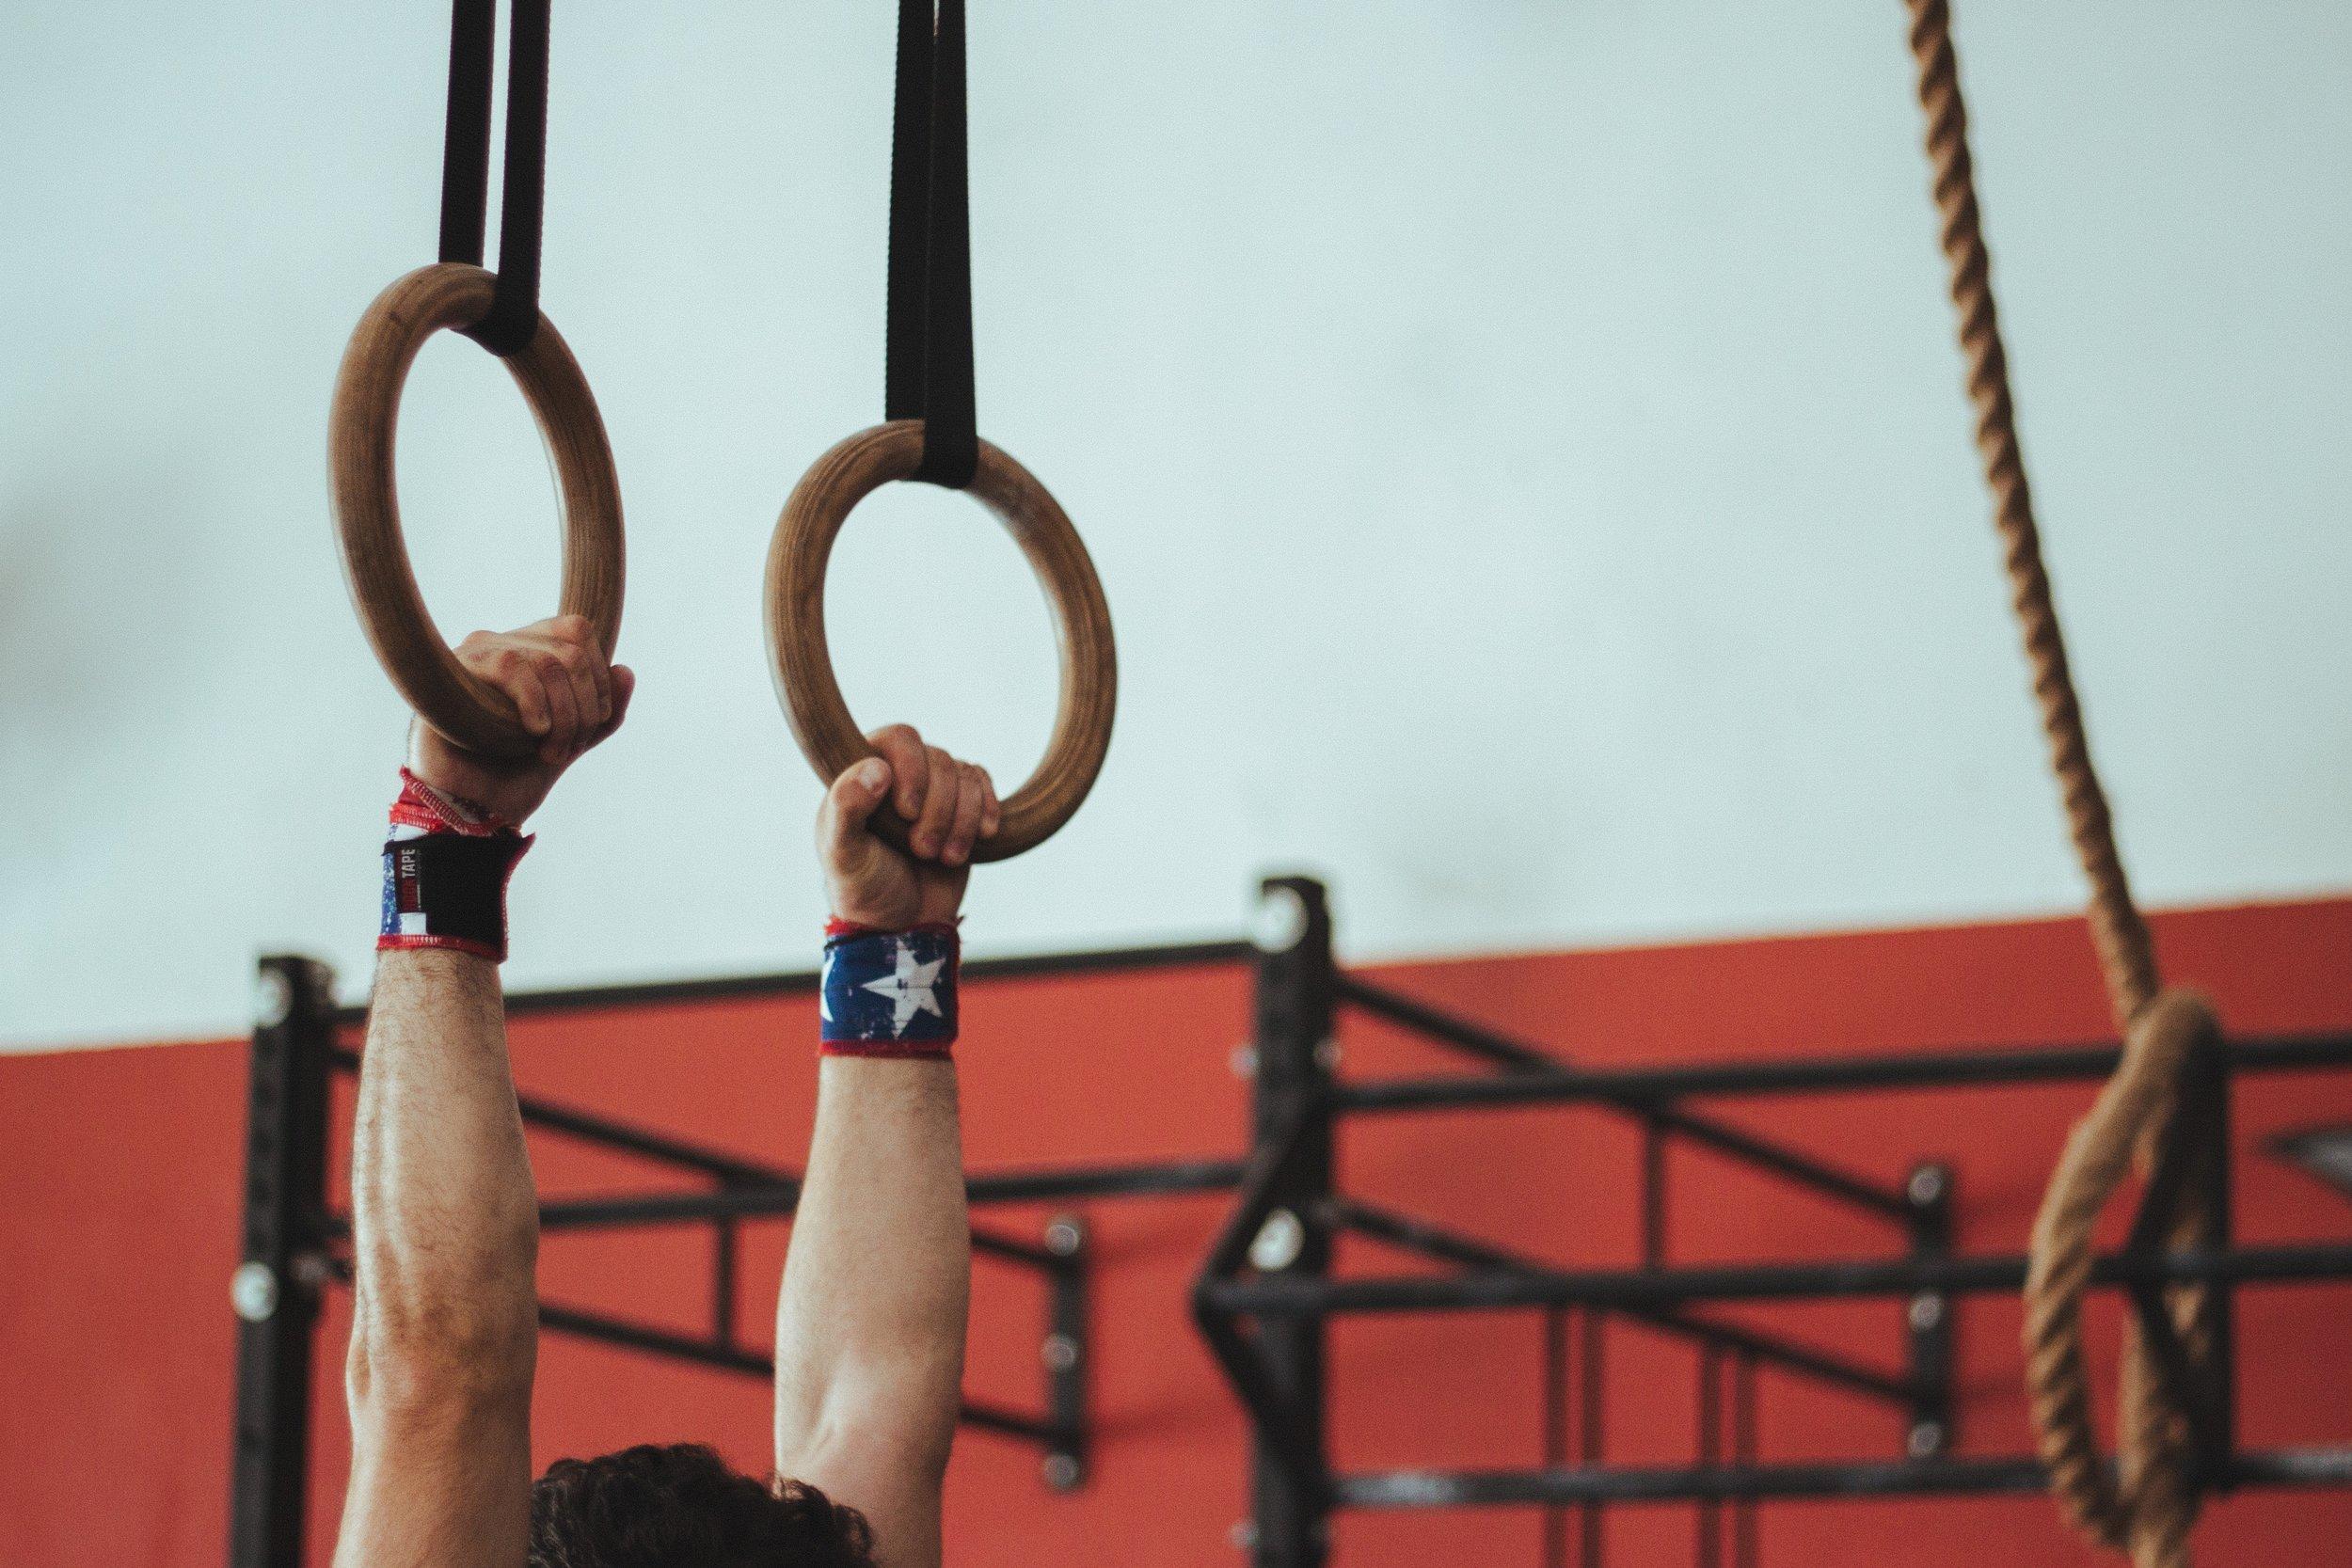 athlete-bodybuilding-fitness-931322.jpg